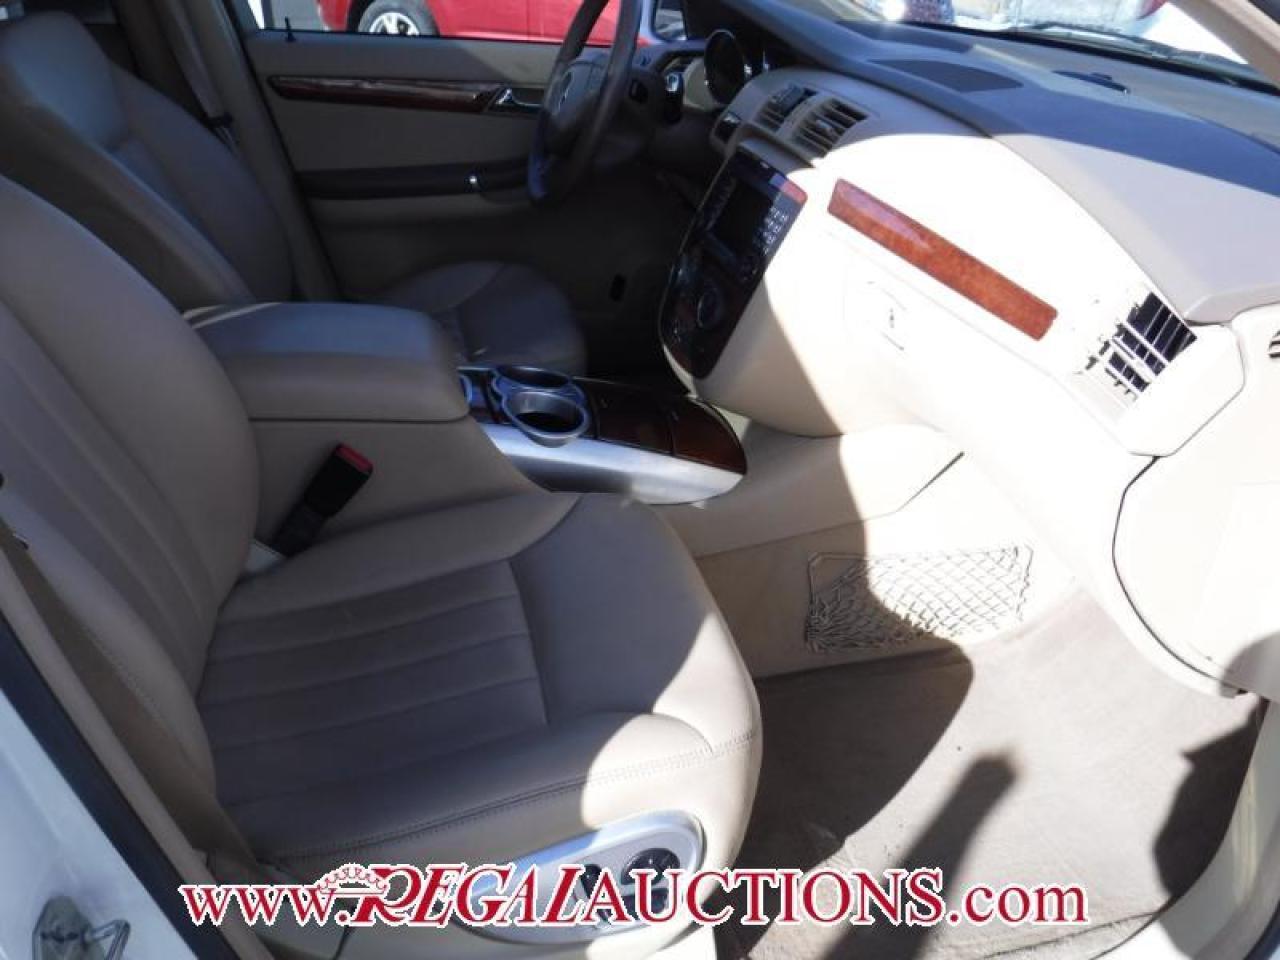 2008 Mercedes-Benz R-CLASS R350 4D UTILITY 4MATIC